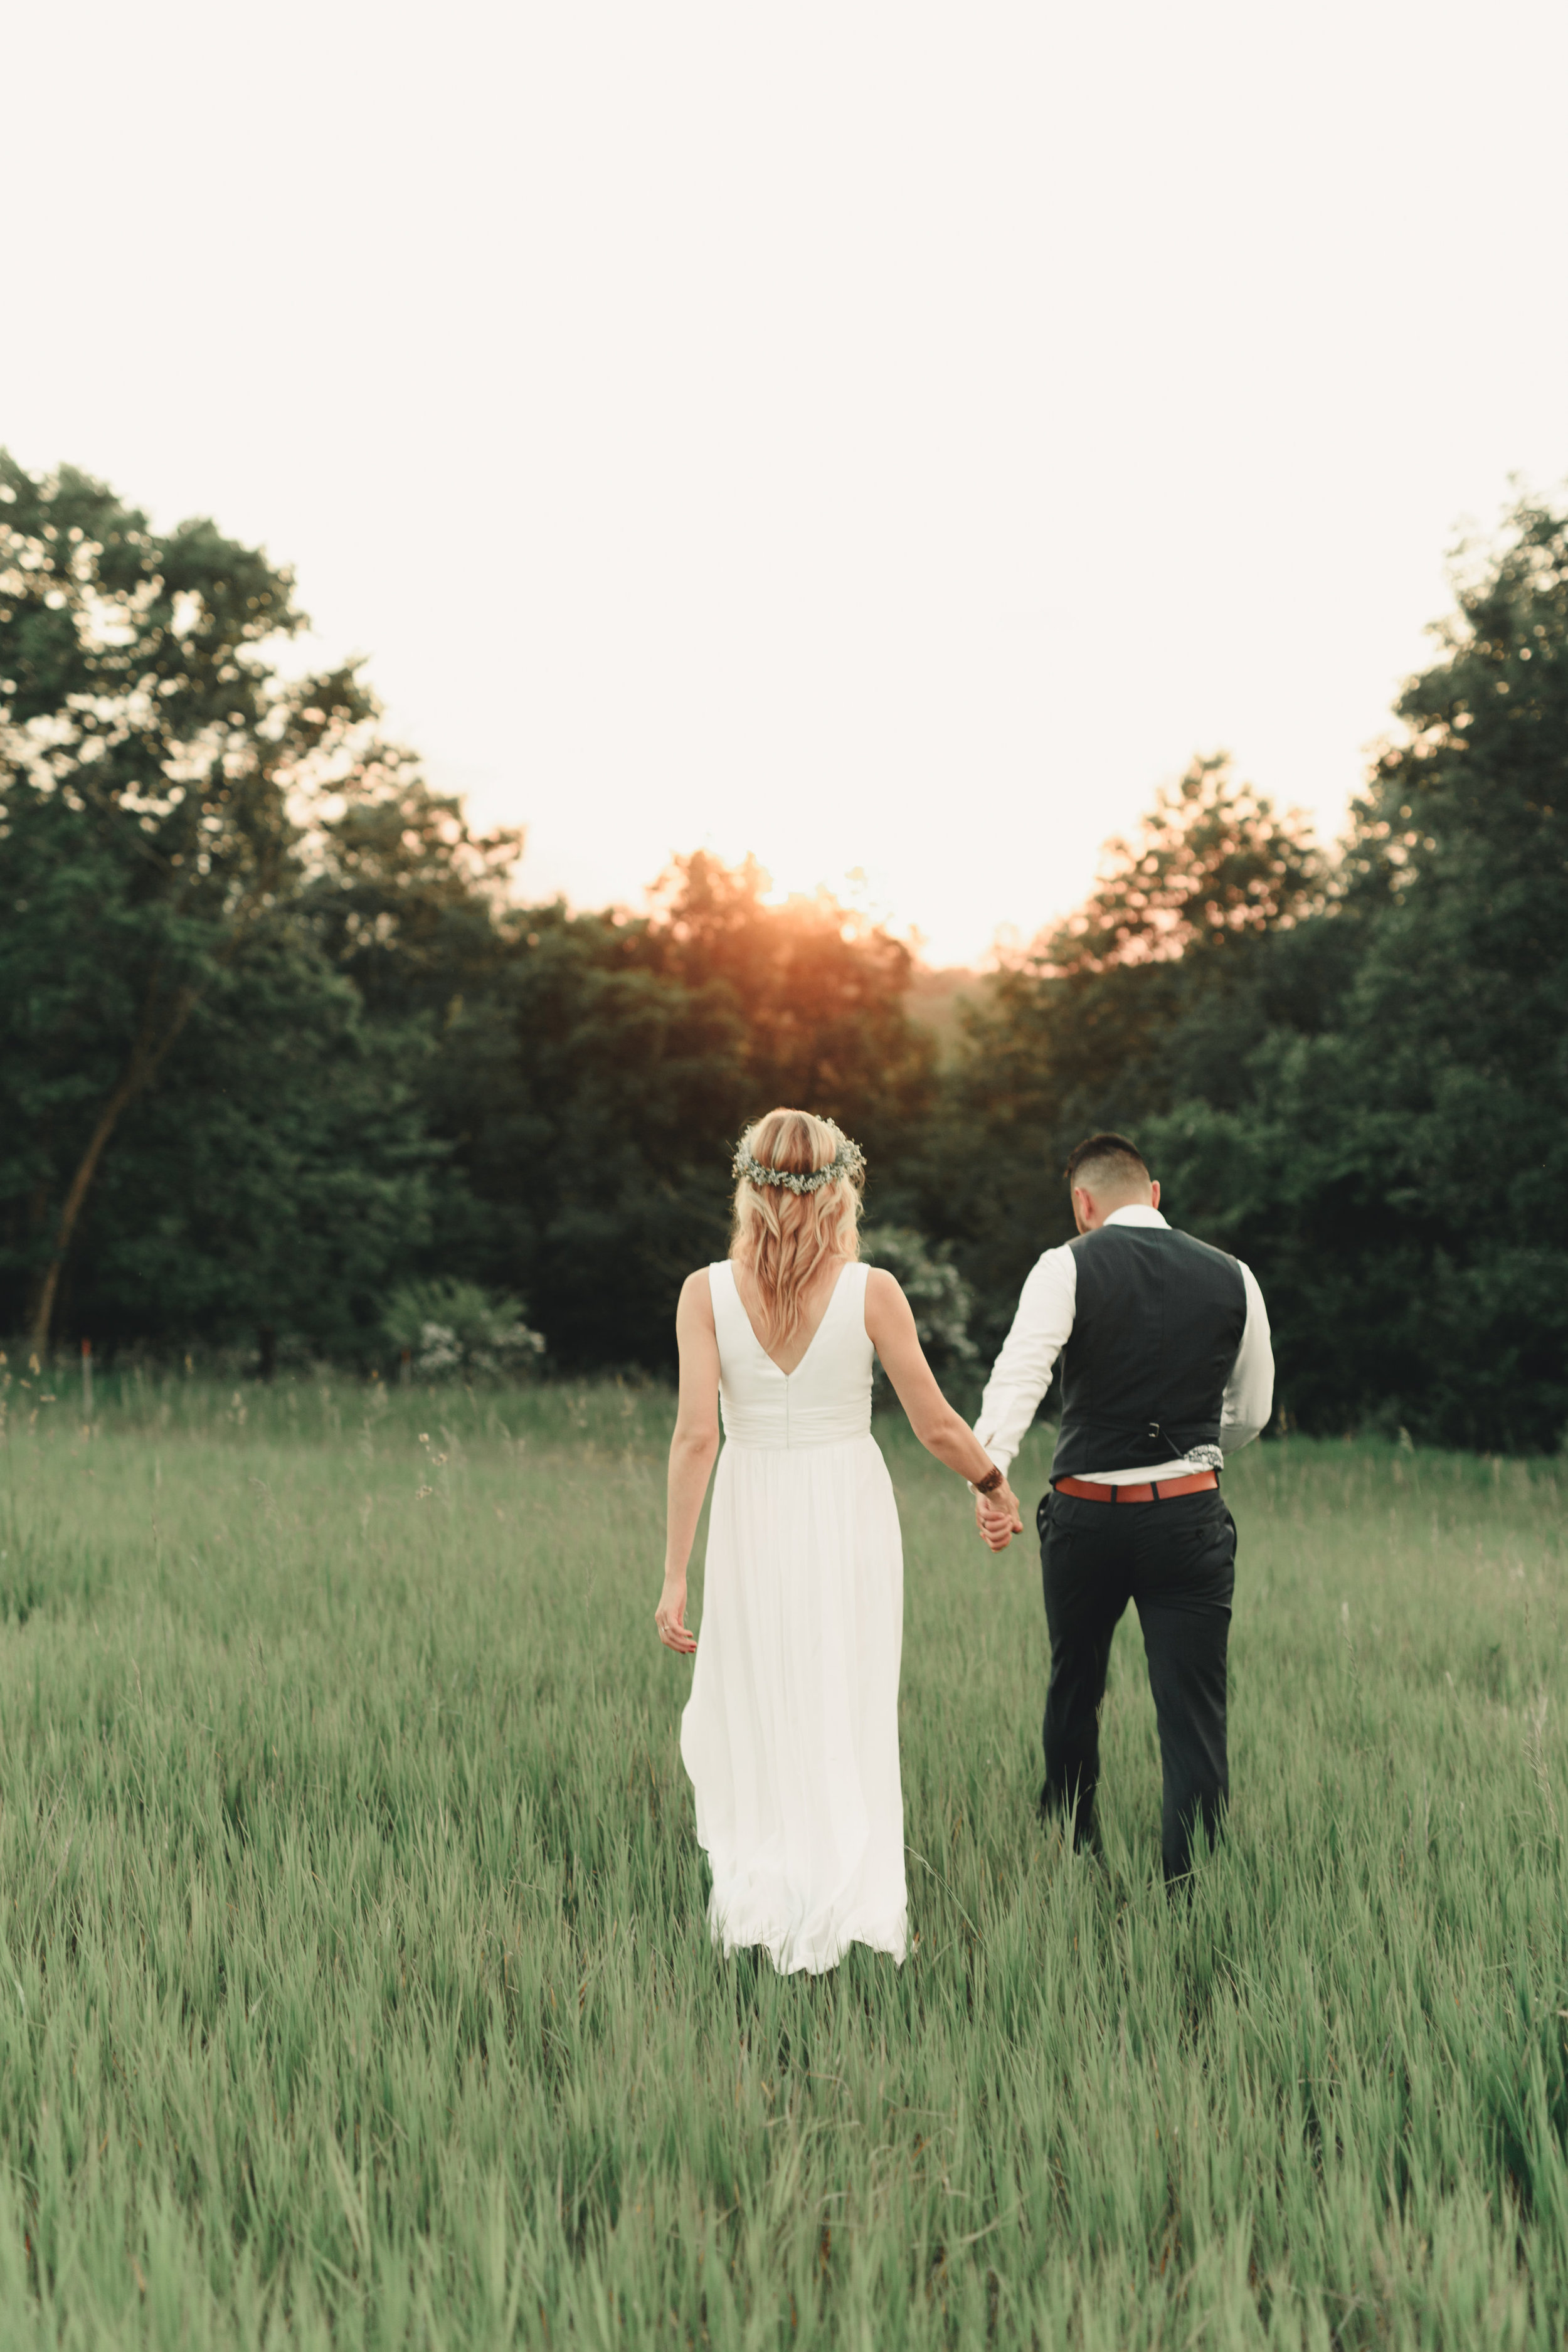 Emily and Zach-Wedding Finals 2-0178.jpg